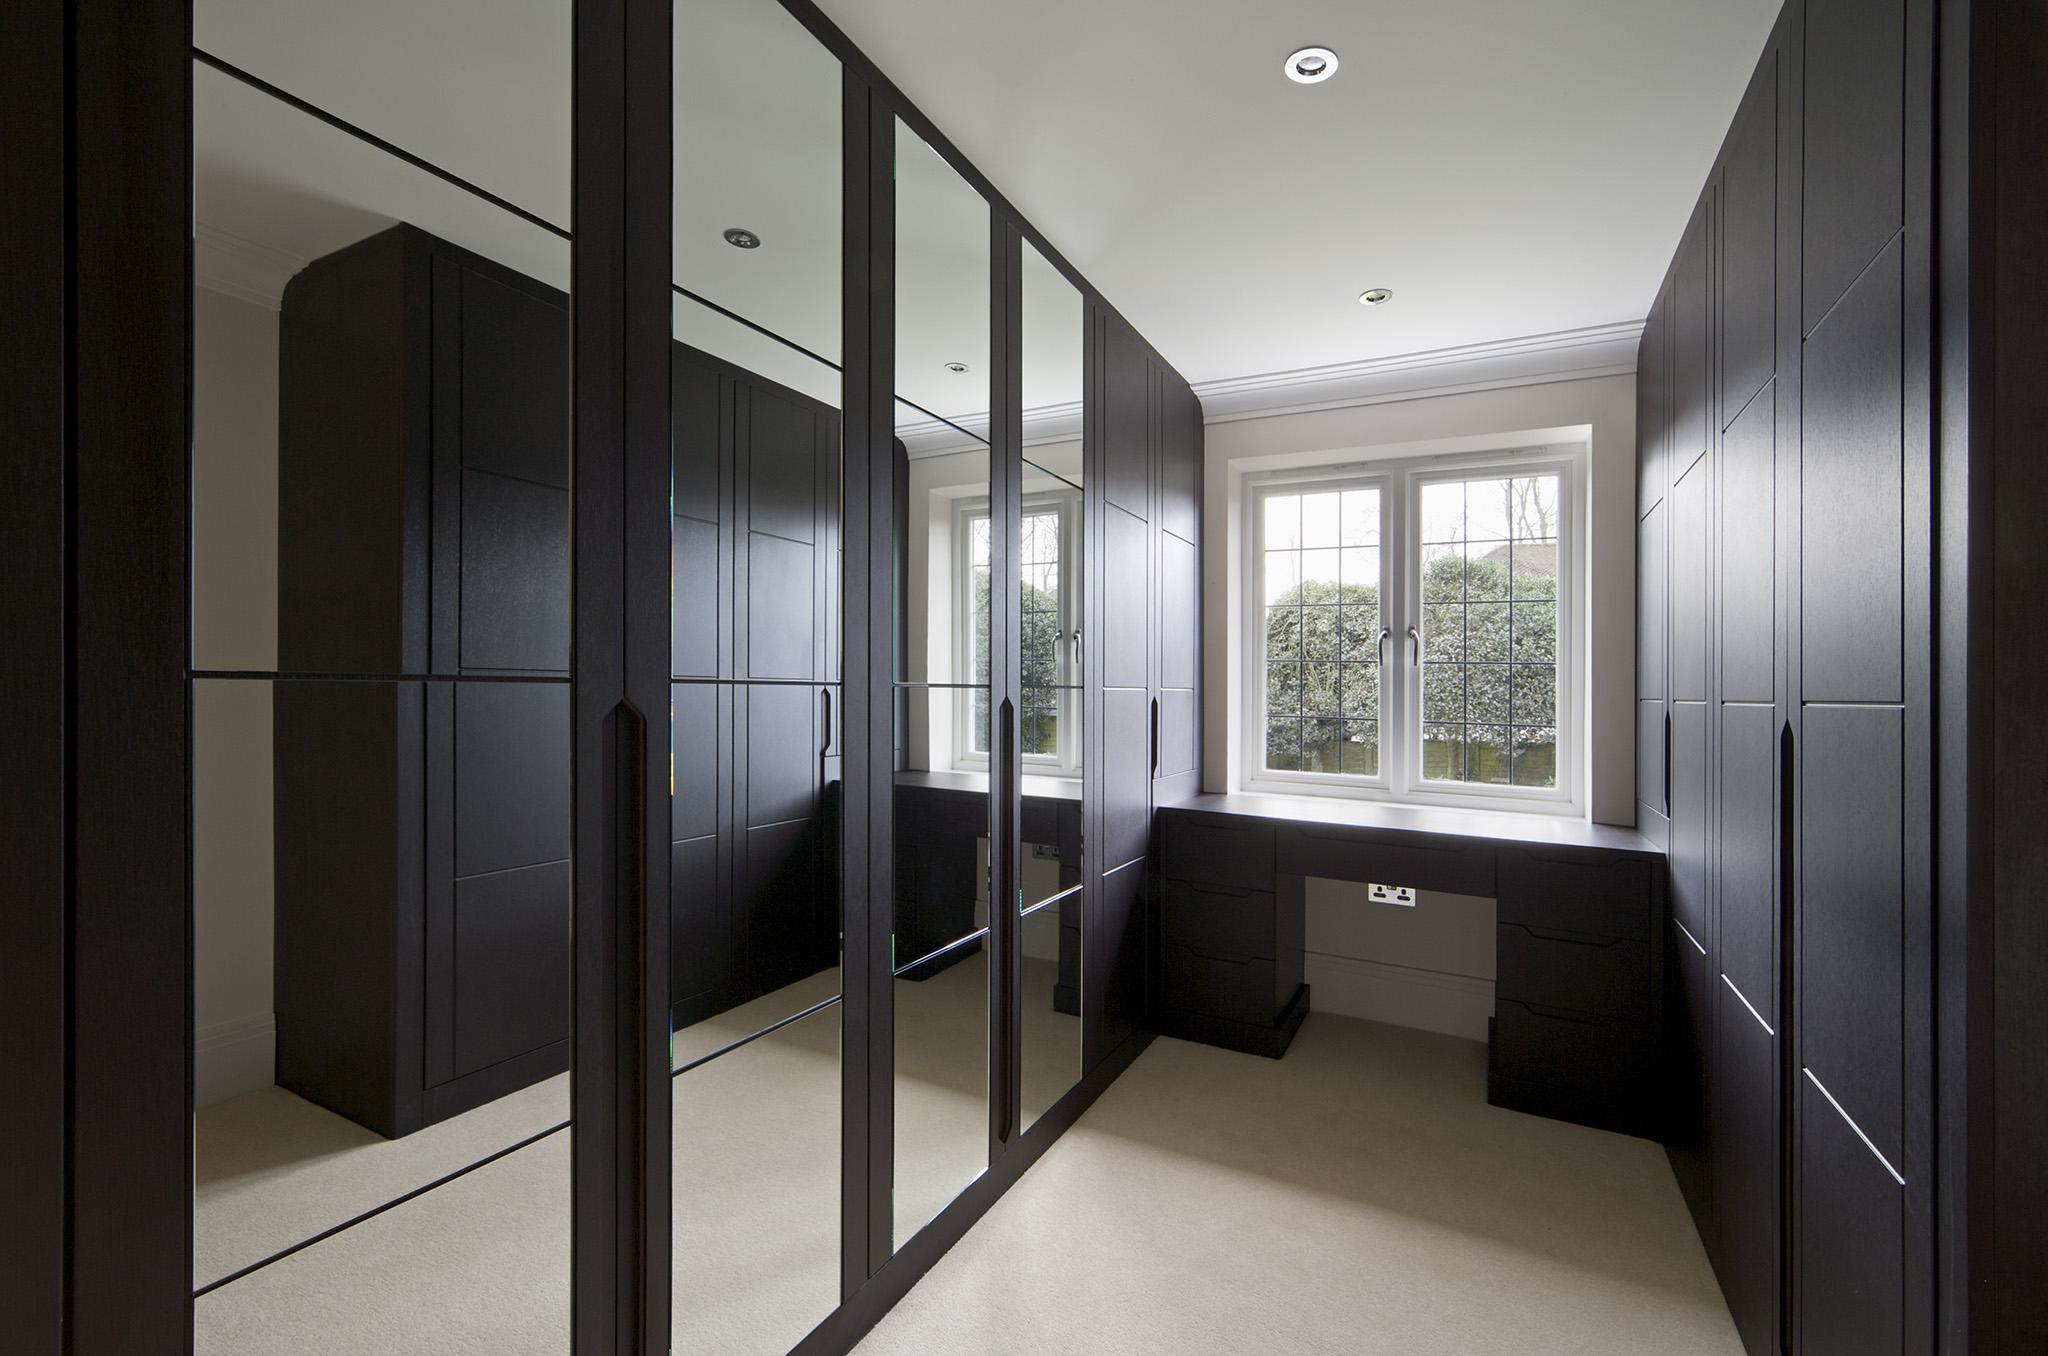 fitted mirrored wardrobes, modern wardrobe, black wardrobe doors